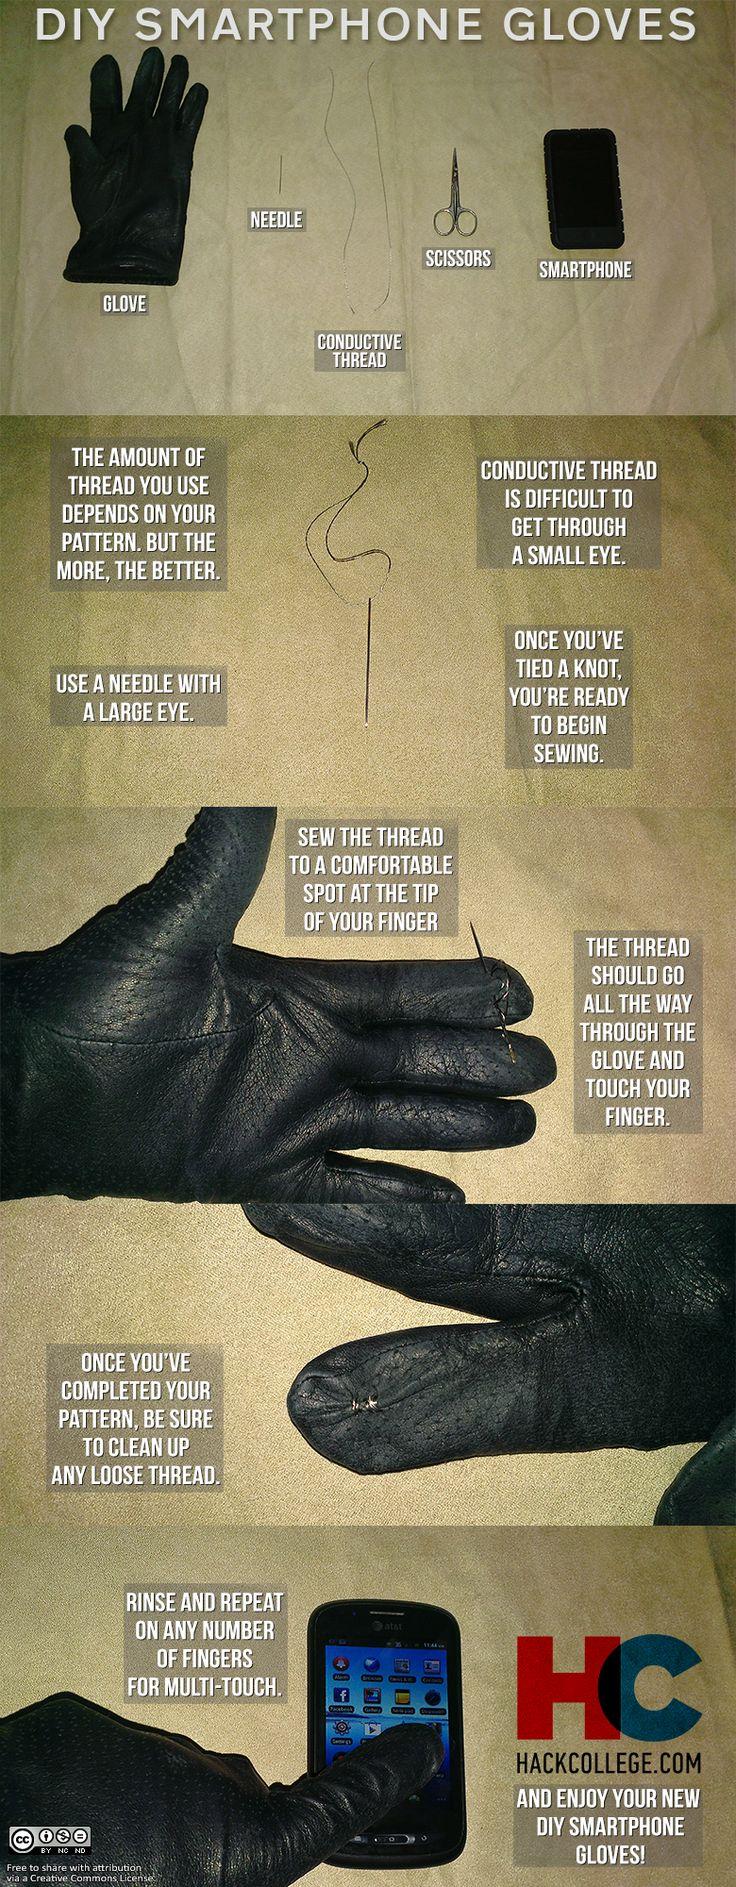 DIY Smartphone Gloves - HackCollege